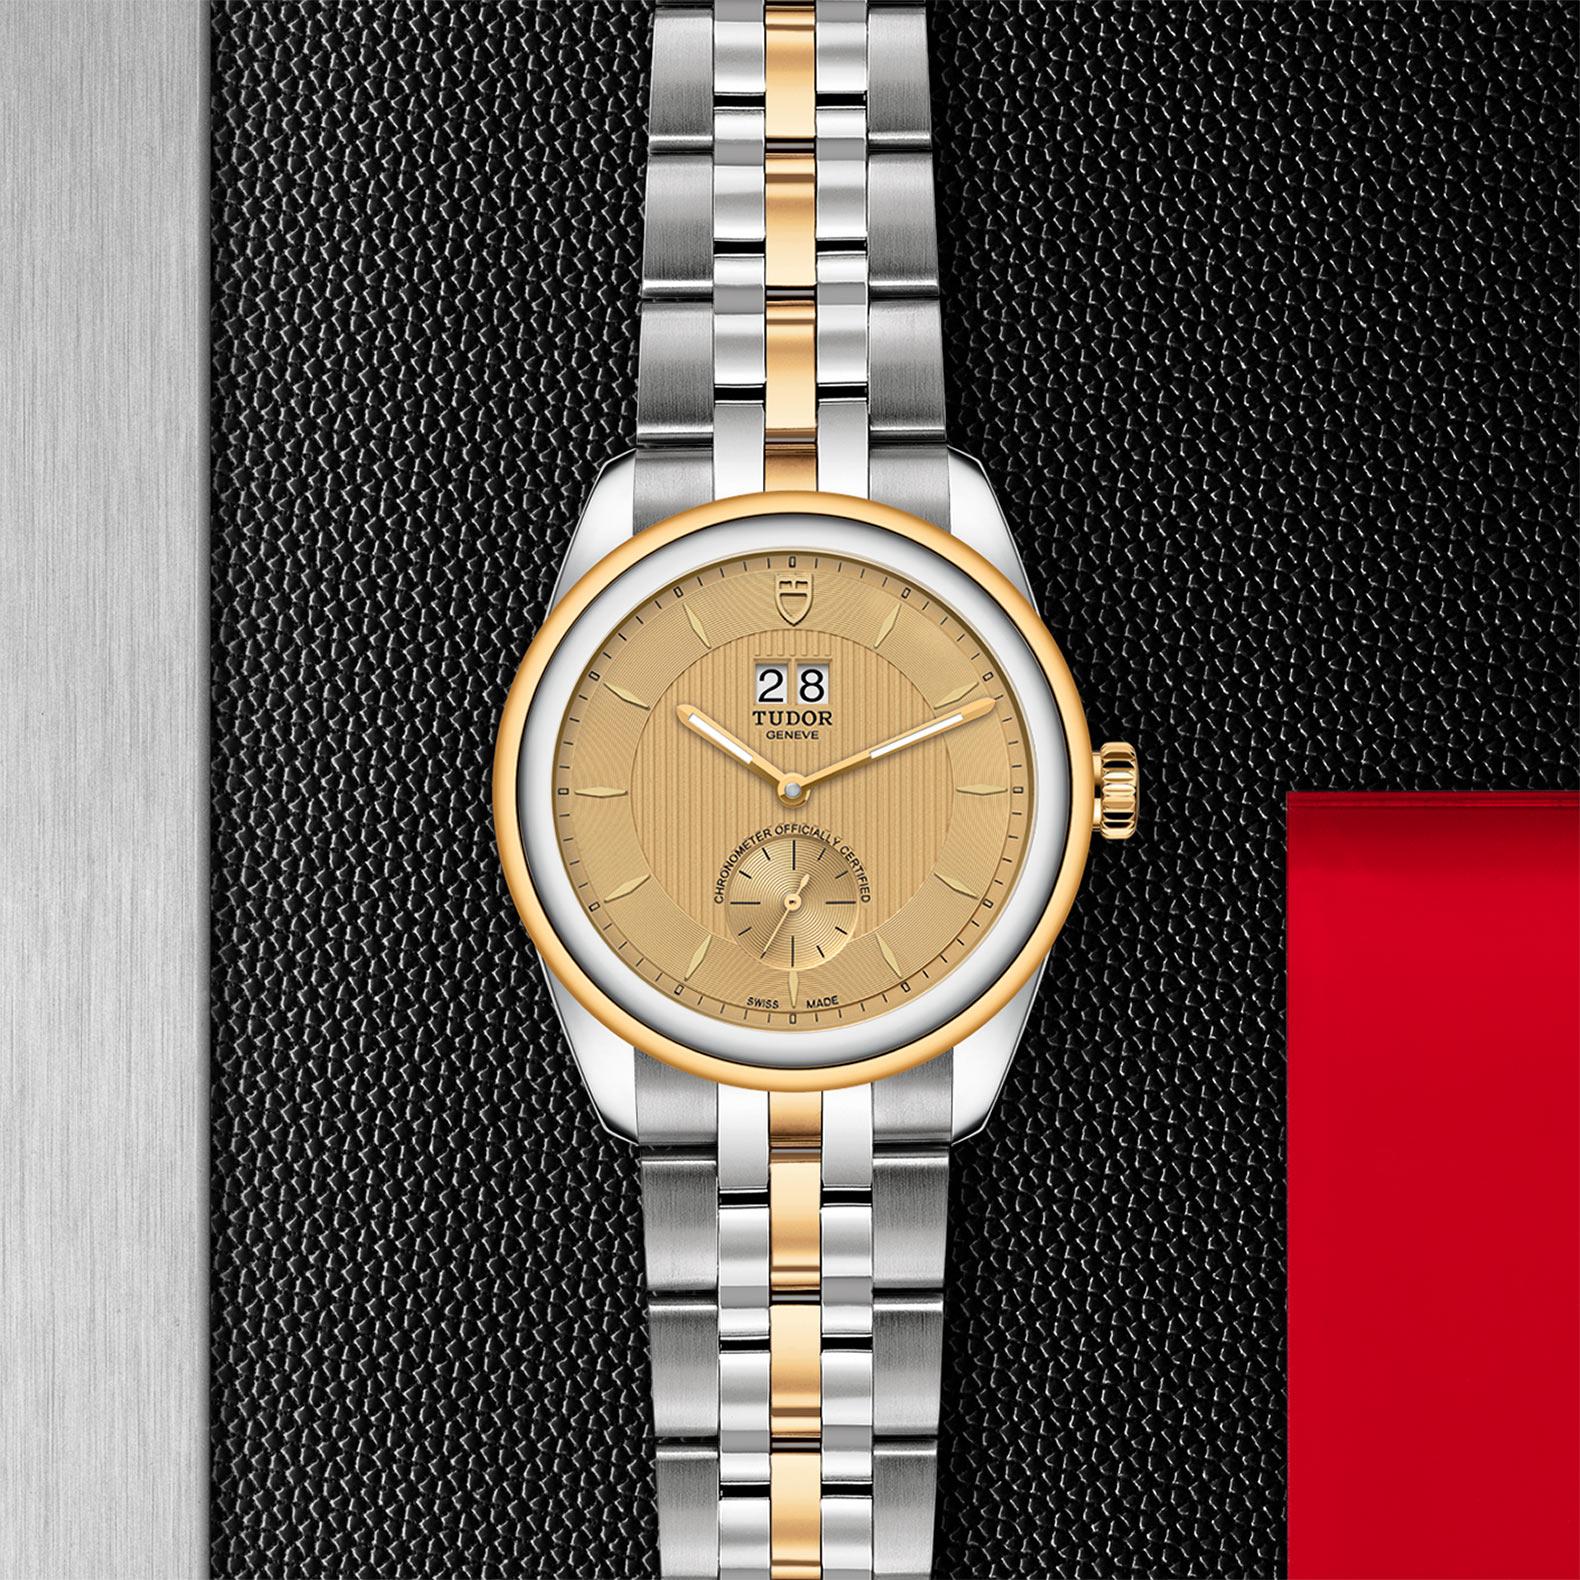 TUDOR Glamour Double Date - M57103-0003